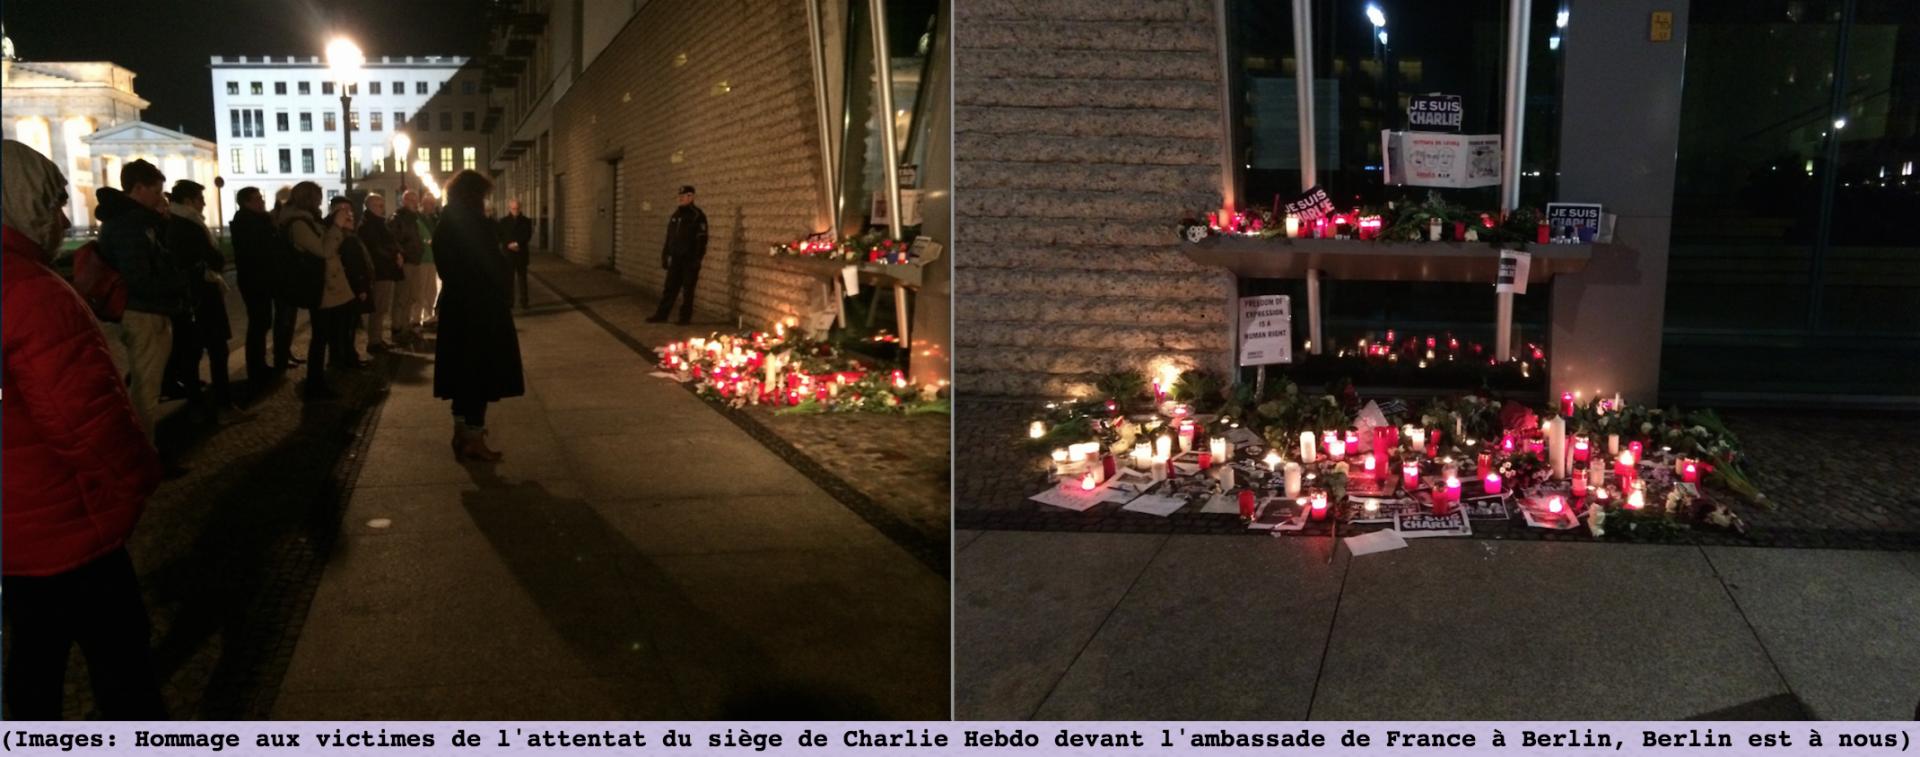 Hommage a charlie hebdo ambassade de france berlin